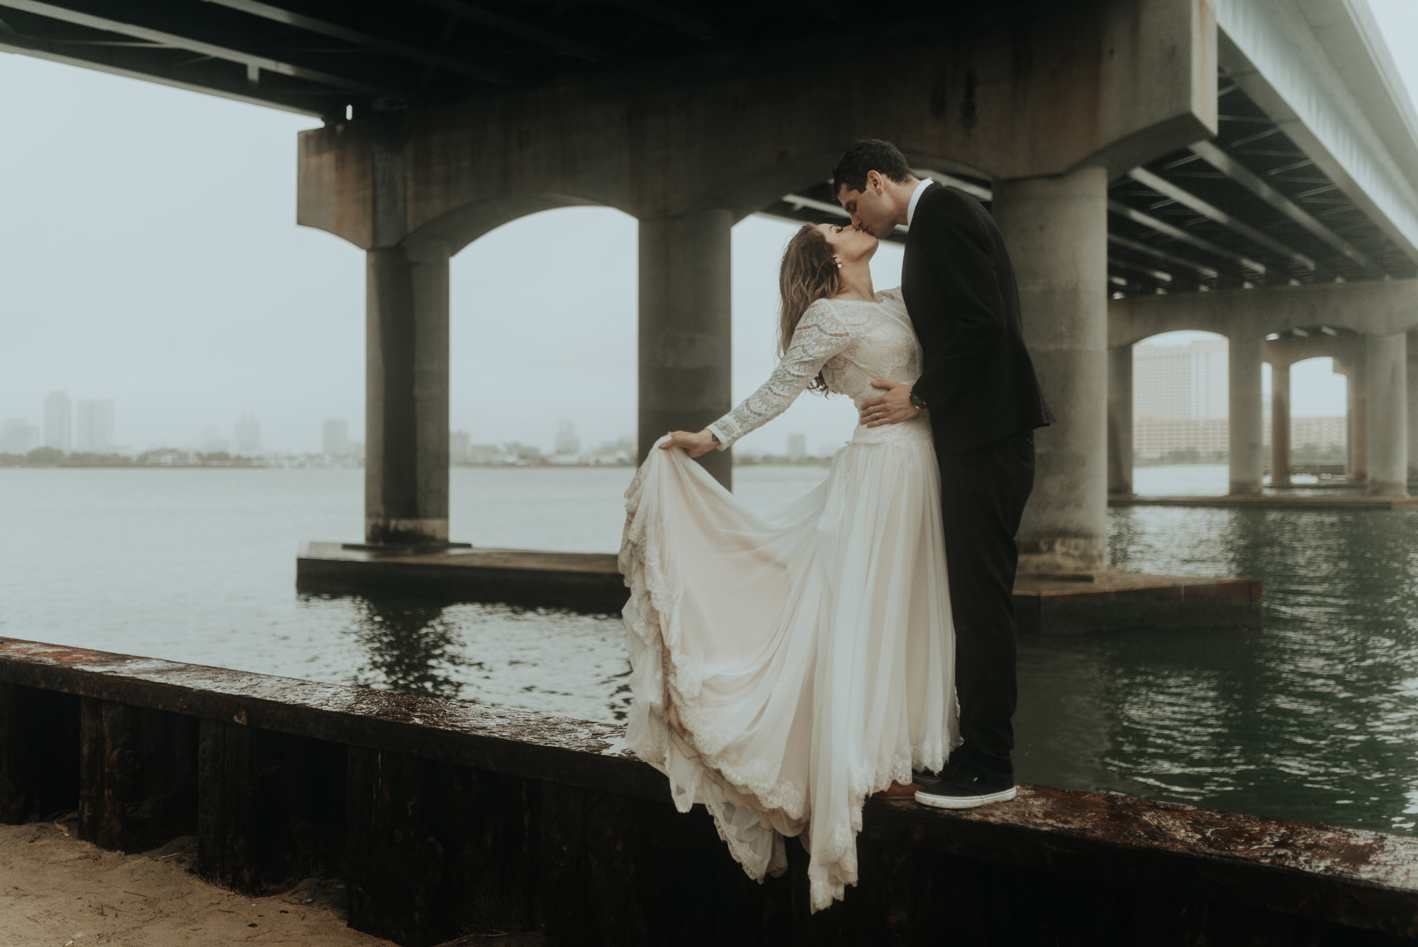 kylewillisphoto_kyle_Willis_Photography_liz_gibbs_brigantine_beach_atlantic_city_wedding_philadelphia_jersey_shore_new_nyc_engagement_delaware_engaged_married_rainy_photos_ac_boho60_2.jpg